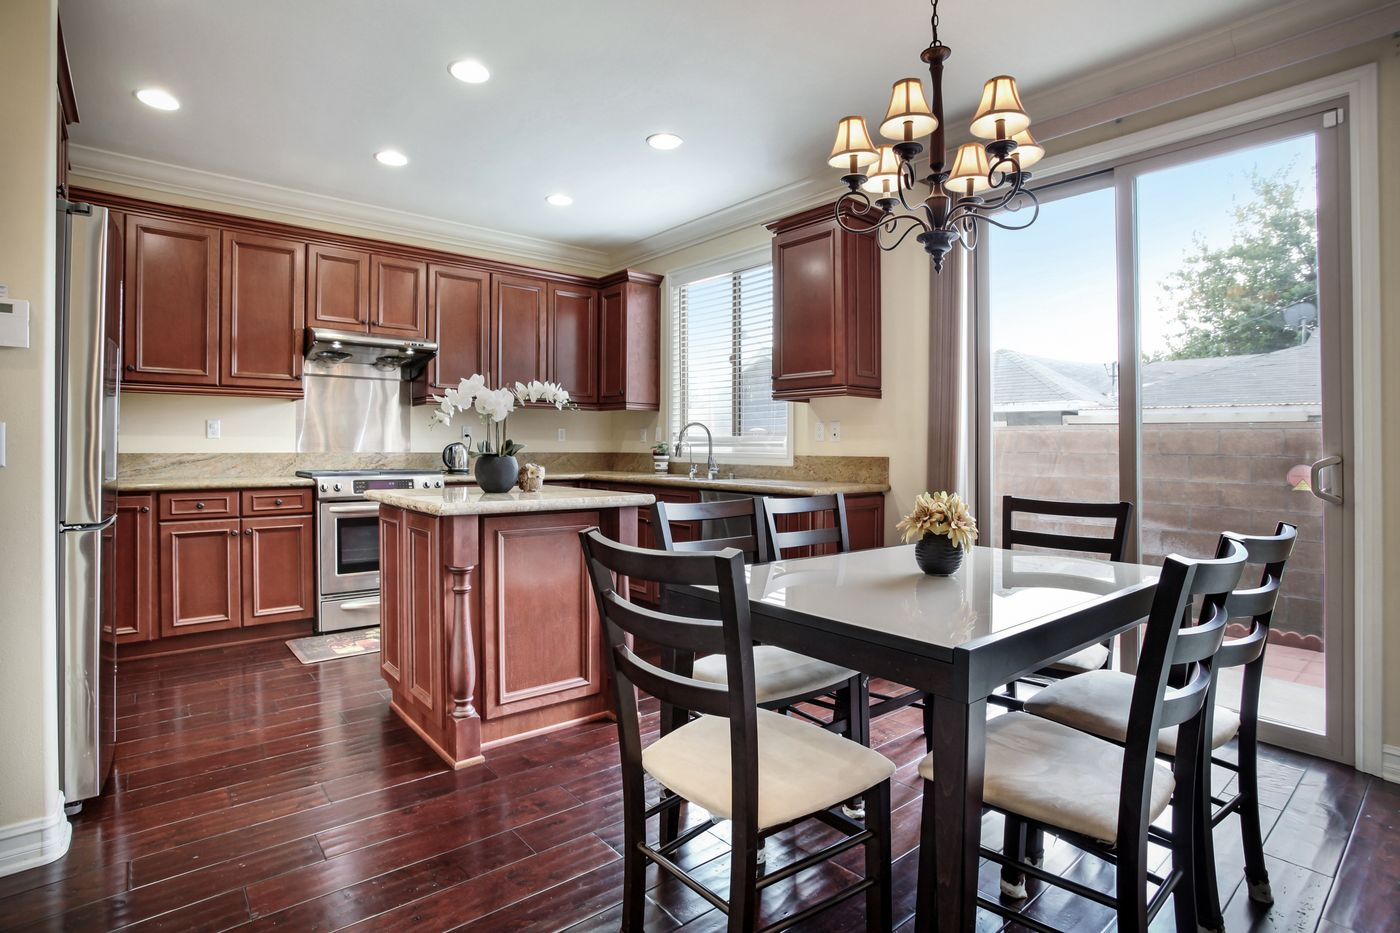 real-estate-photography-los-angeles-pasadena-glendale-burbank-5015 Farago Ave-Temple City-photographer-4